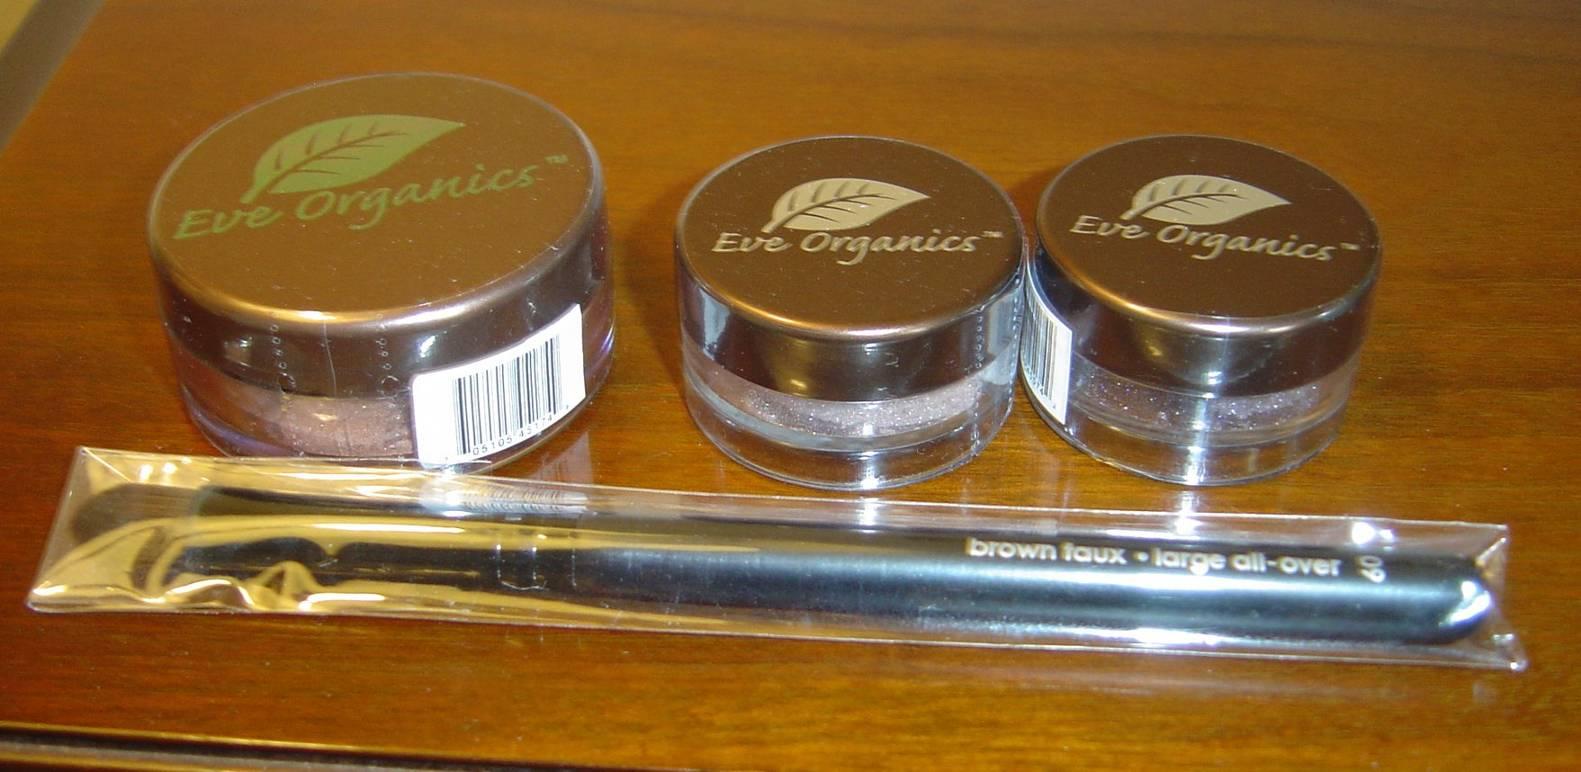 Eve-Organics-mineral-makeup-assortment.jpeg